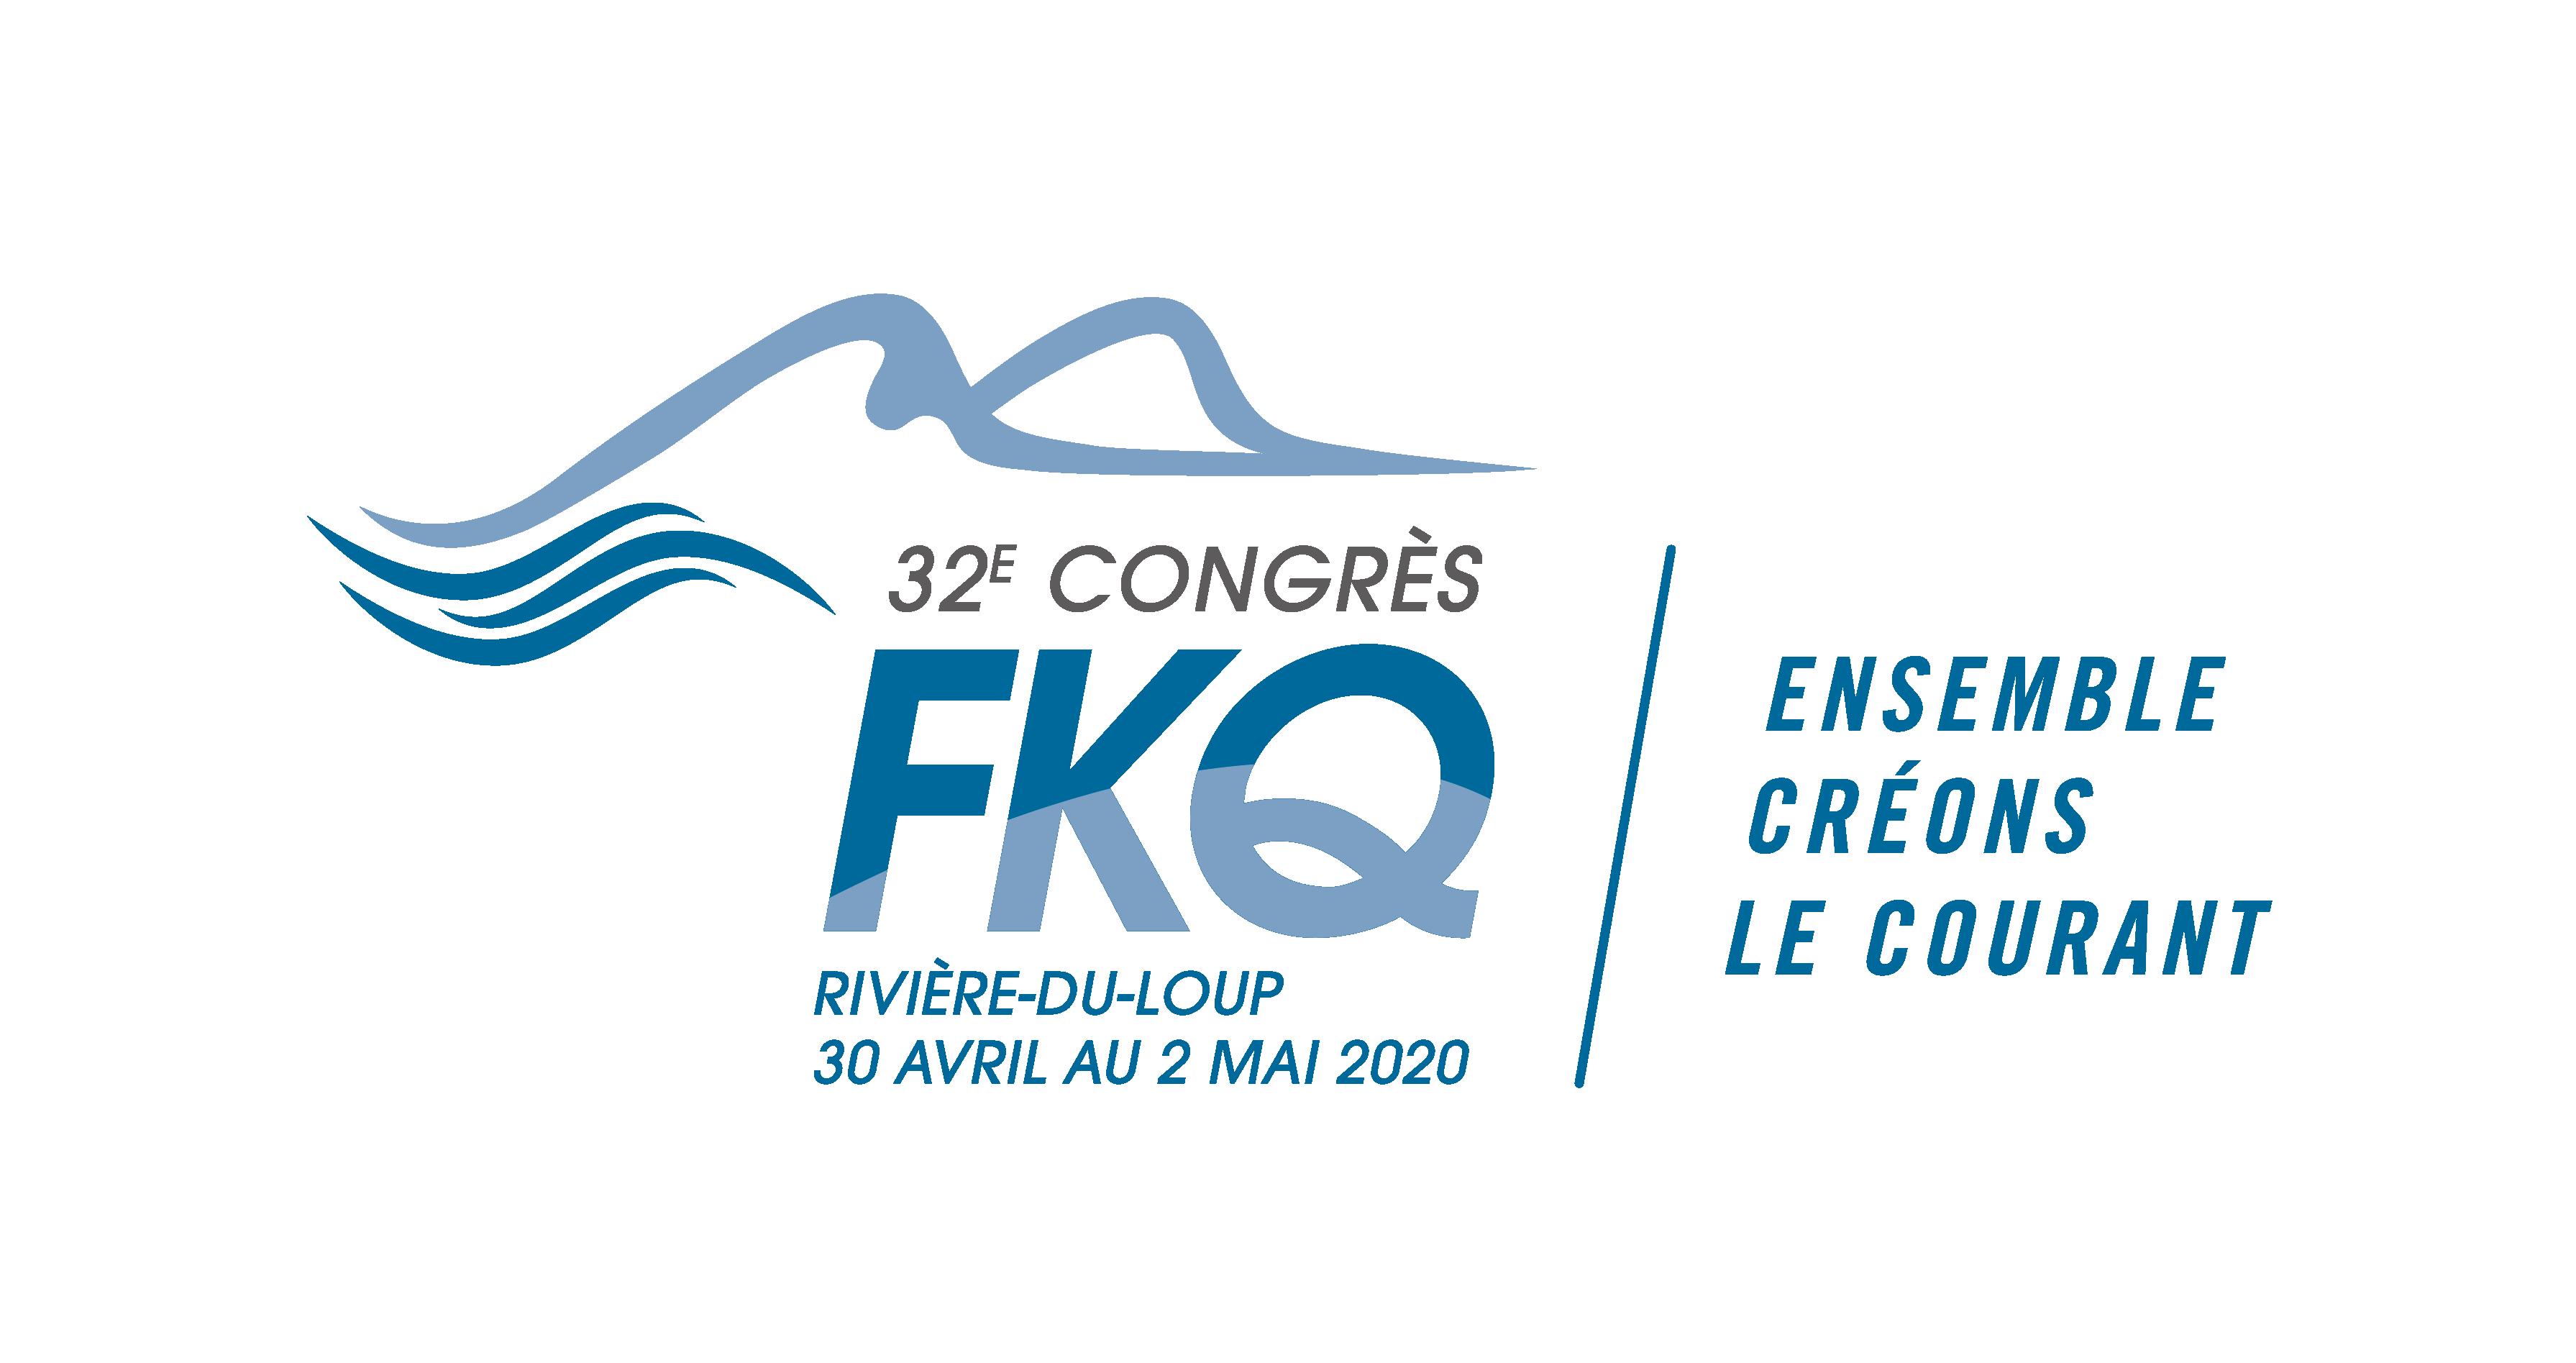 Congrès de la FKQ - édition 2020